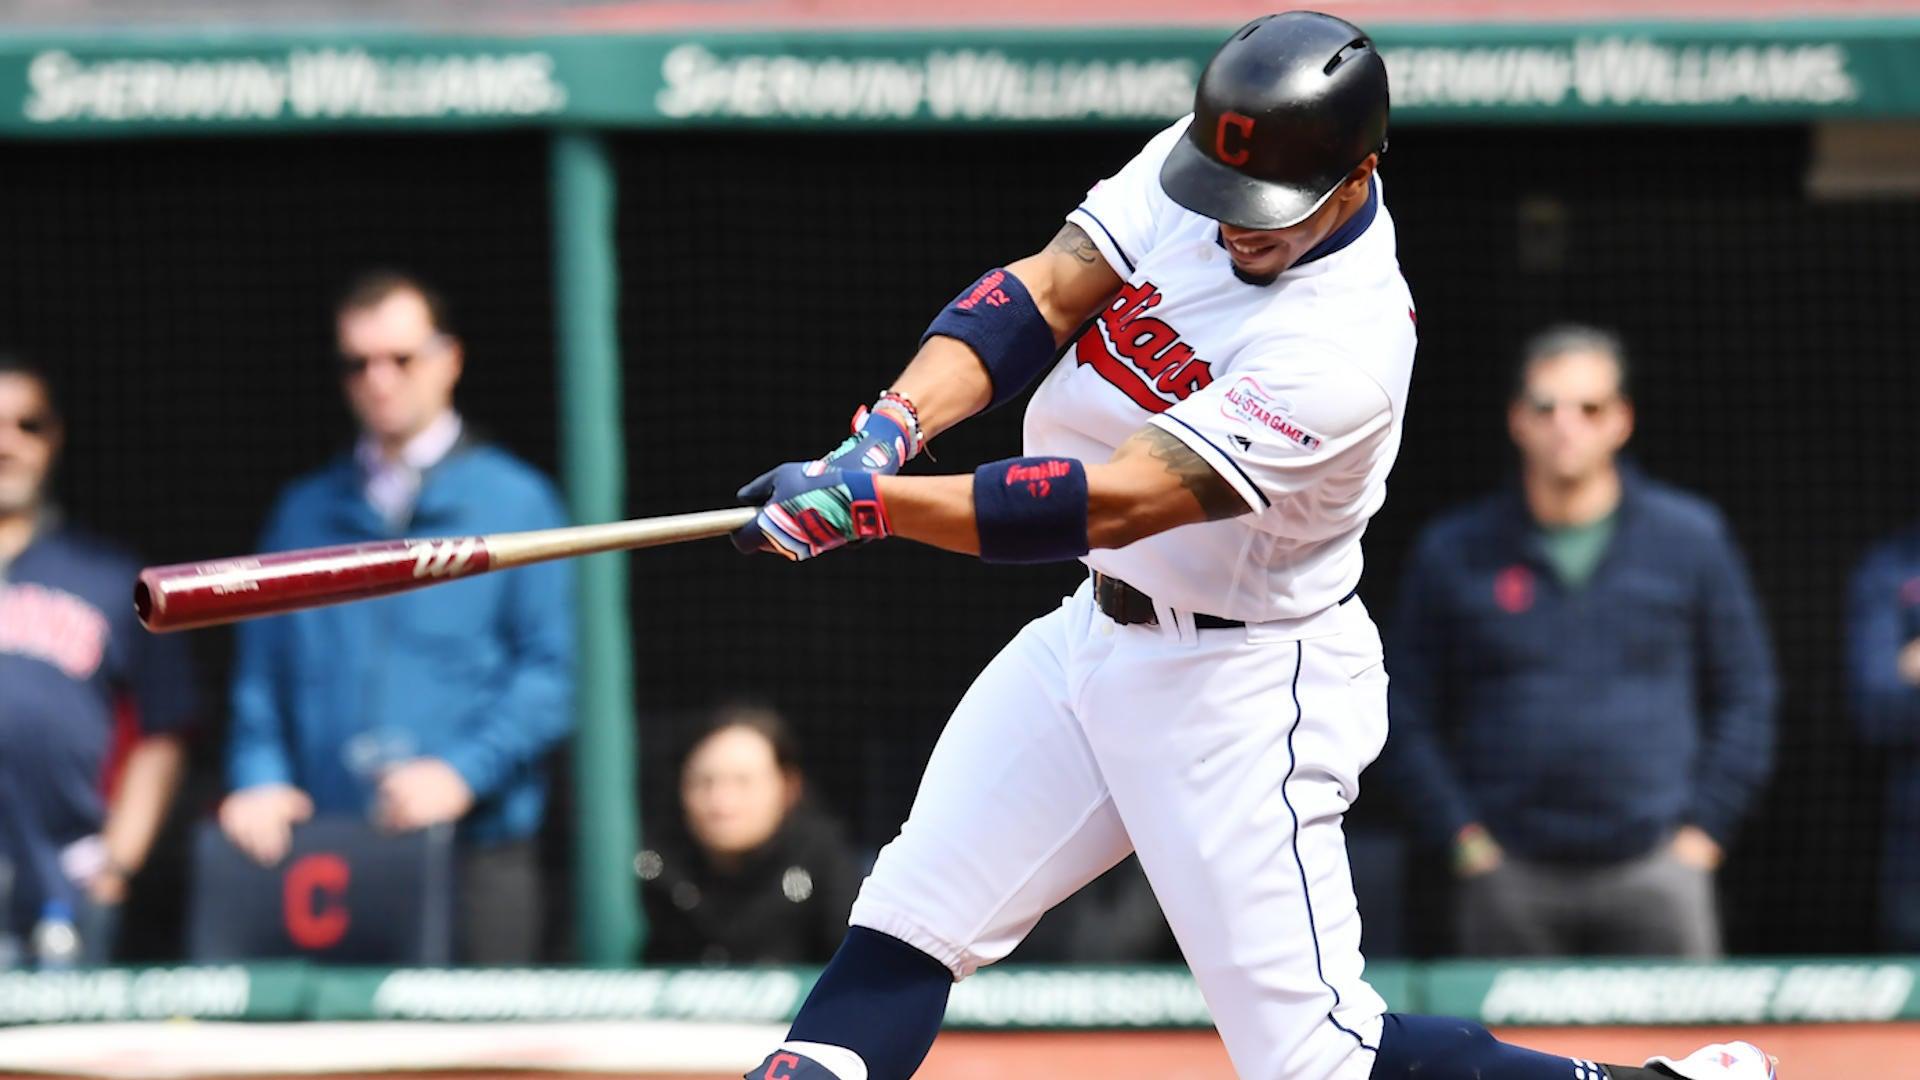 Vladimir Guerrero Jr. will be called up by Blue Jays, make anticipated MLB debut Friday vs. Athletics